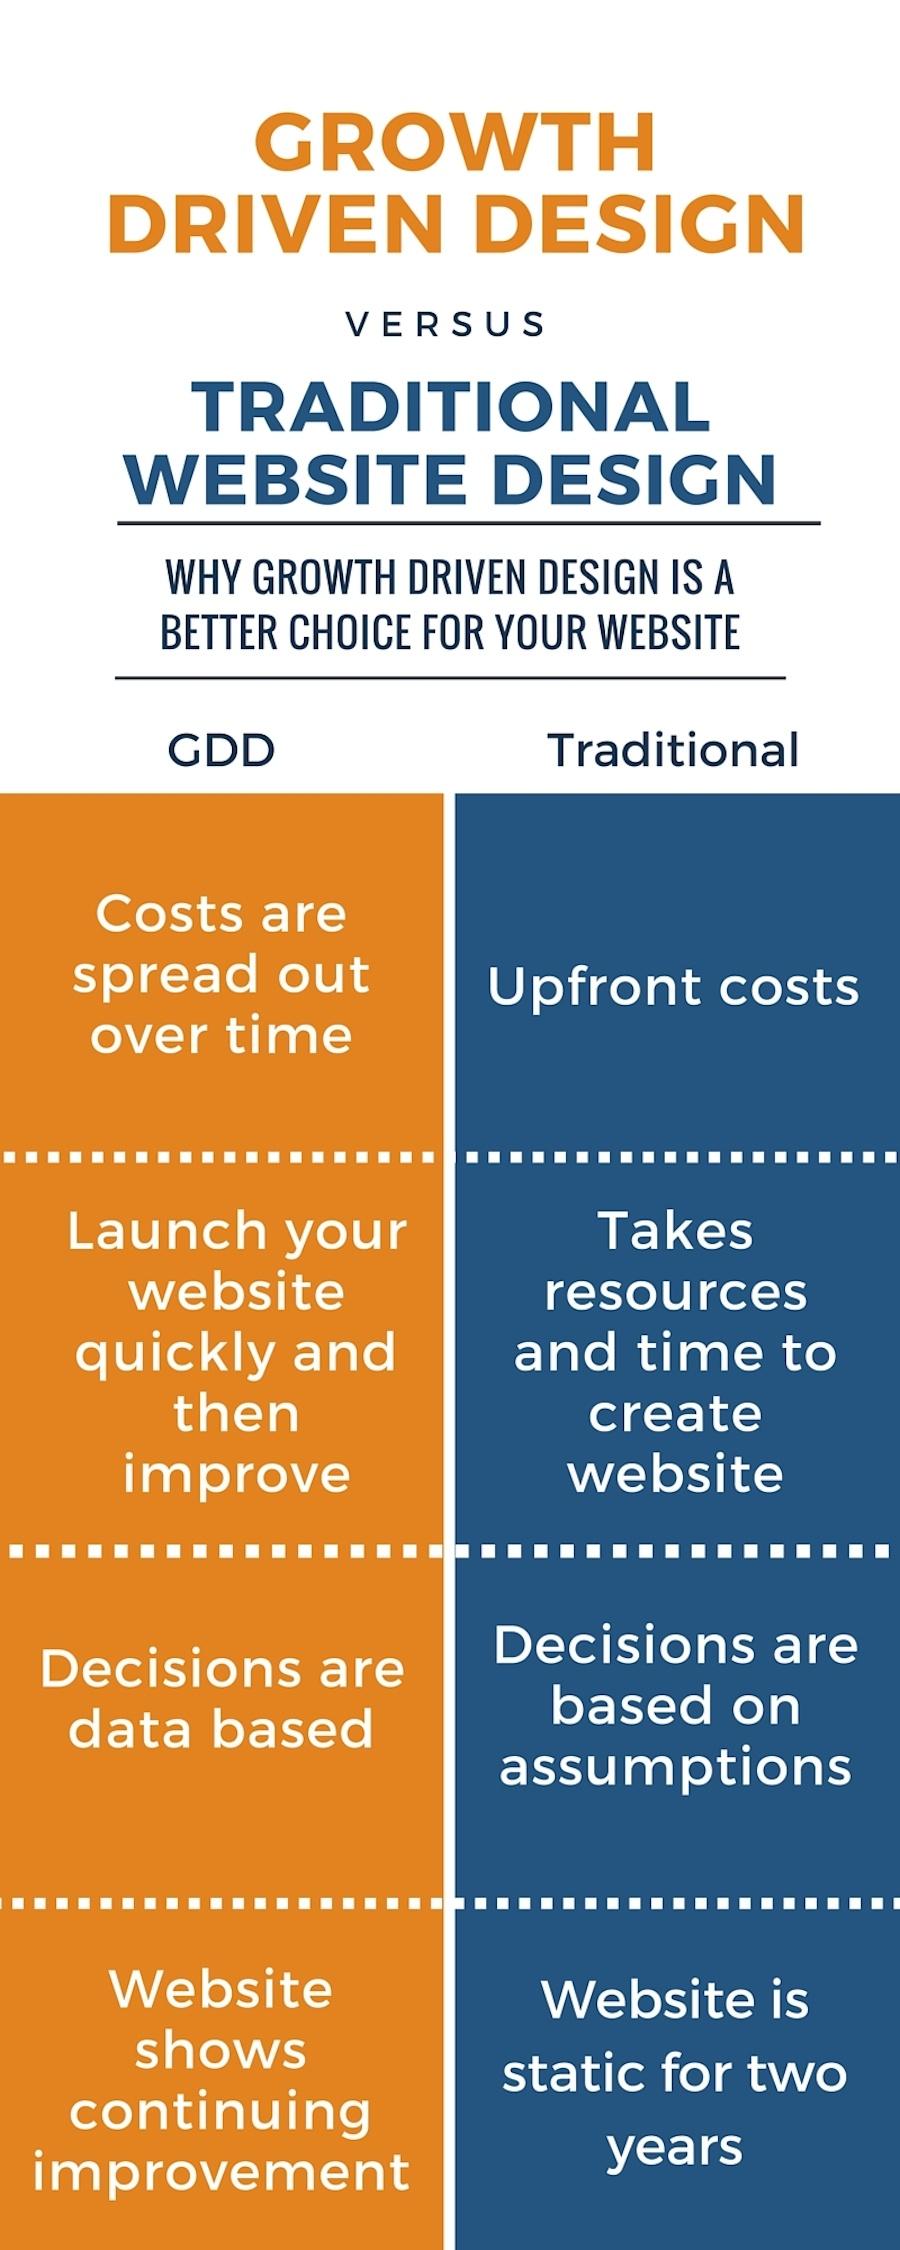 GDD vs. Traditional Web Design